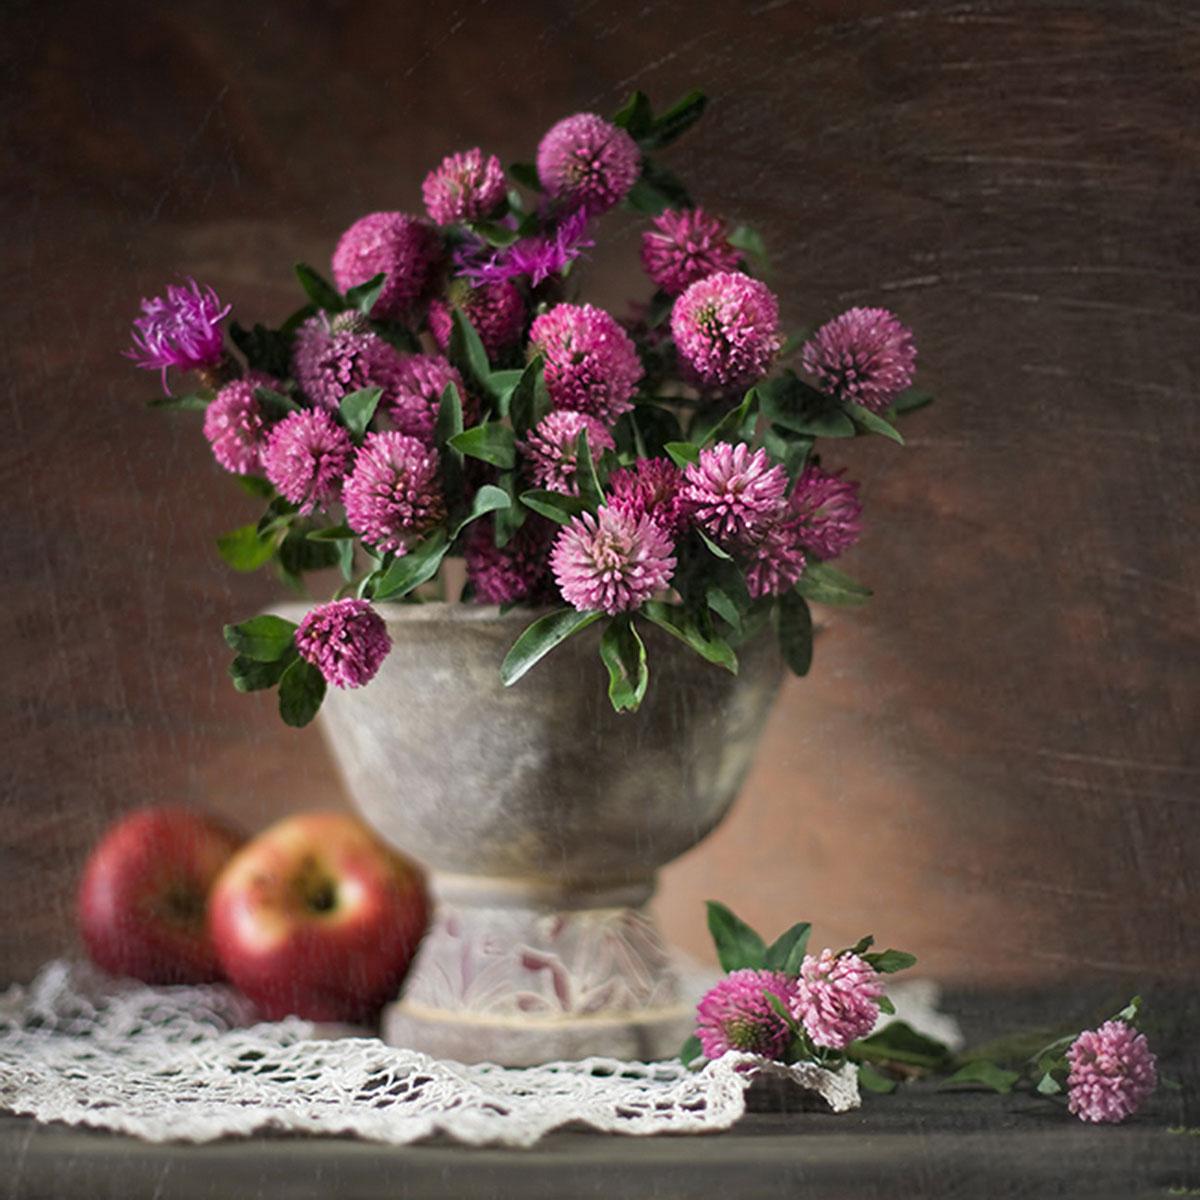 عکس گل نرگس در گلدان